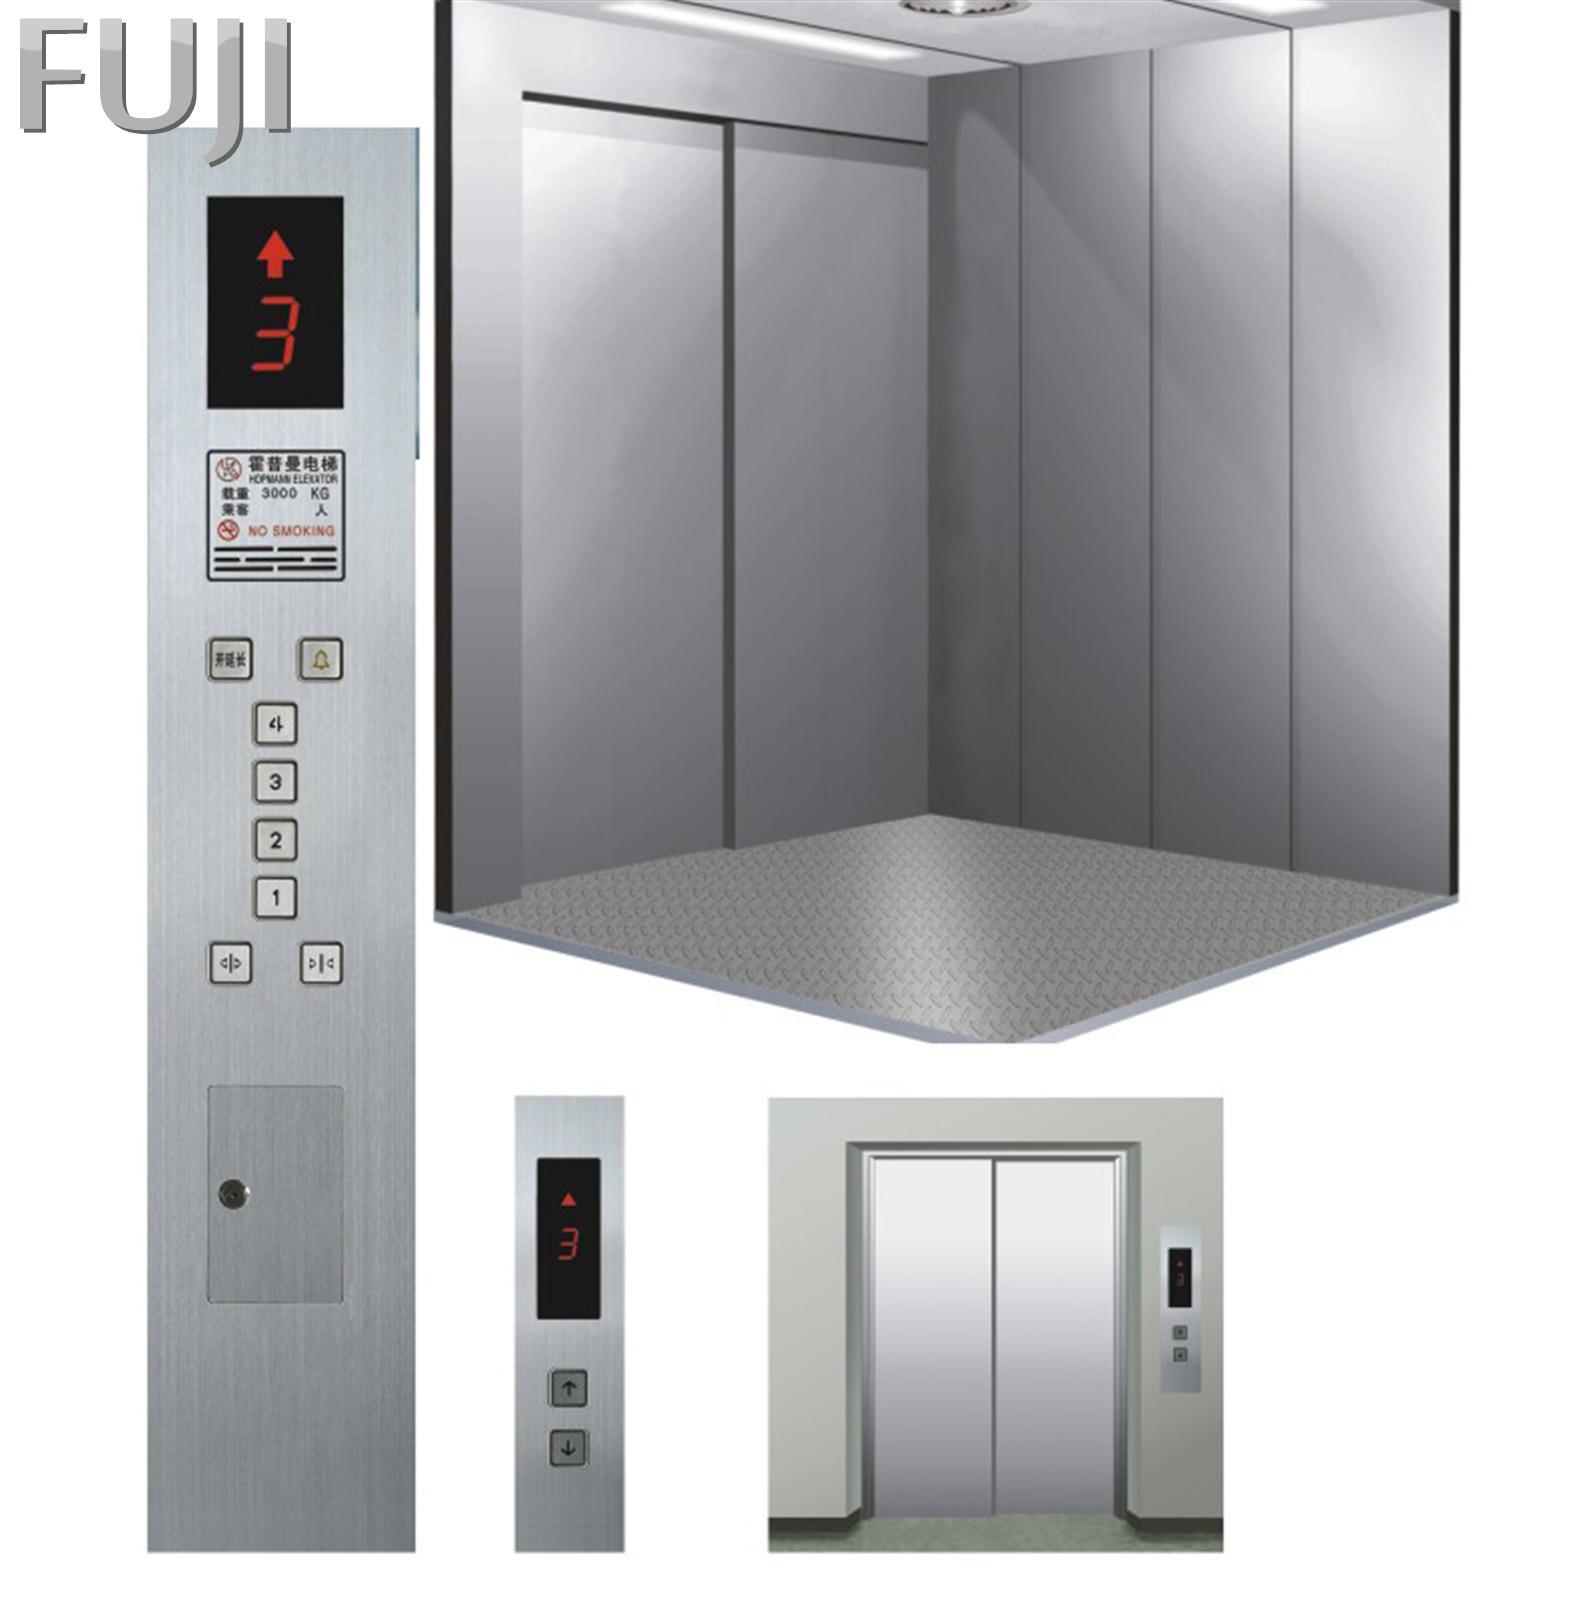 Freight Elevator / Lift 3000kg